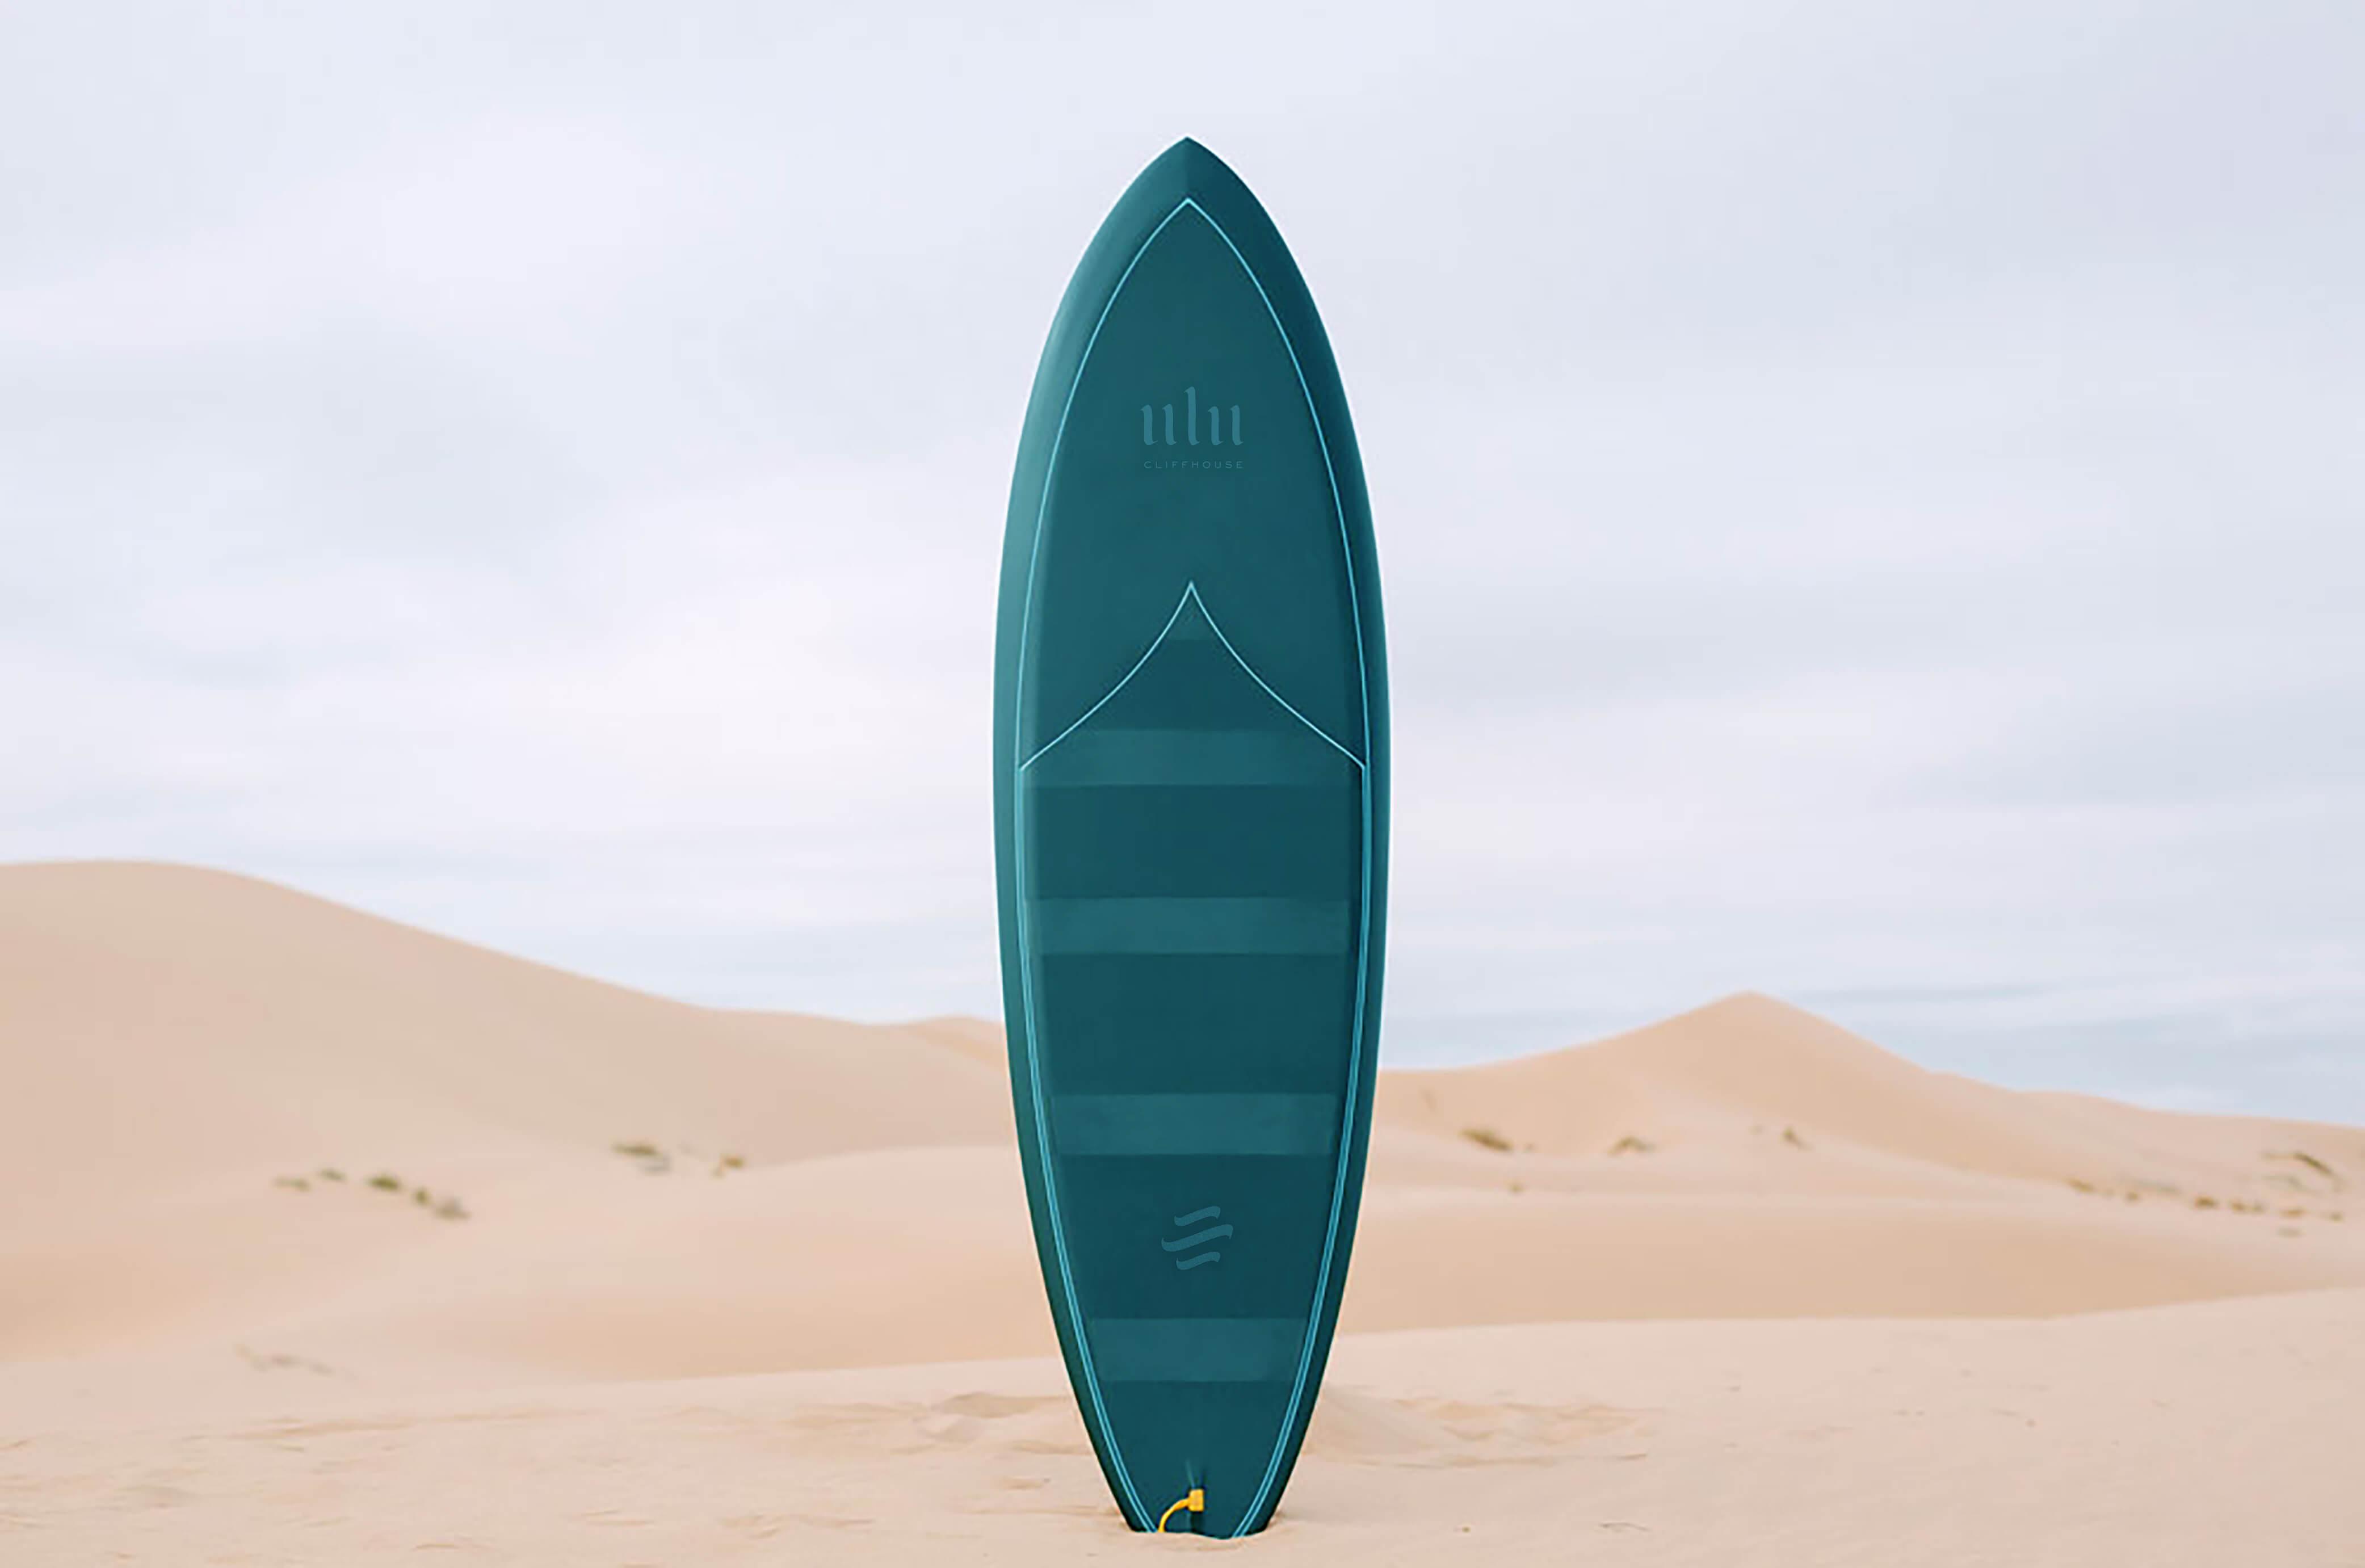 Glossy surfboard mockup copy